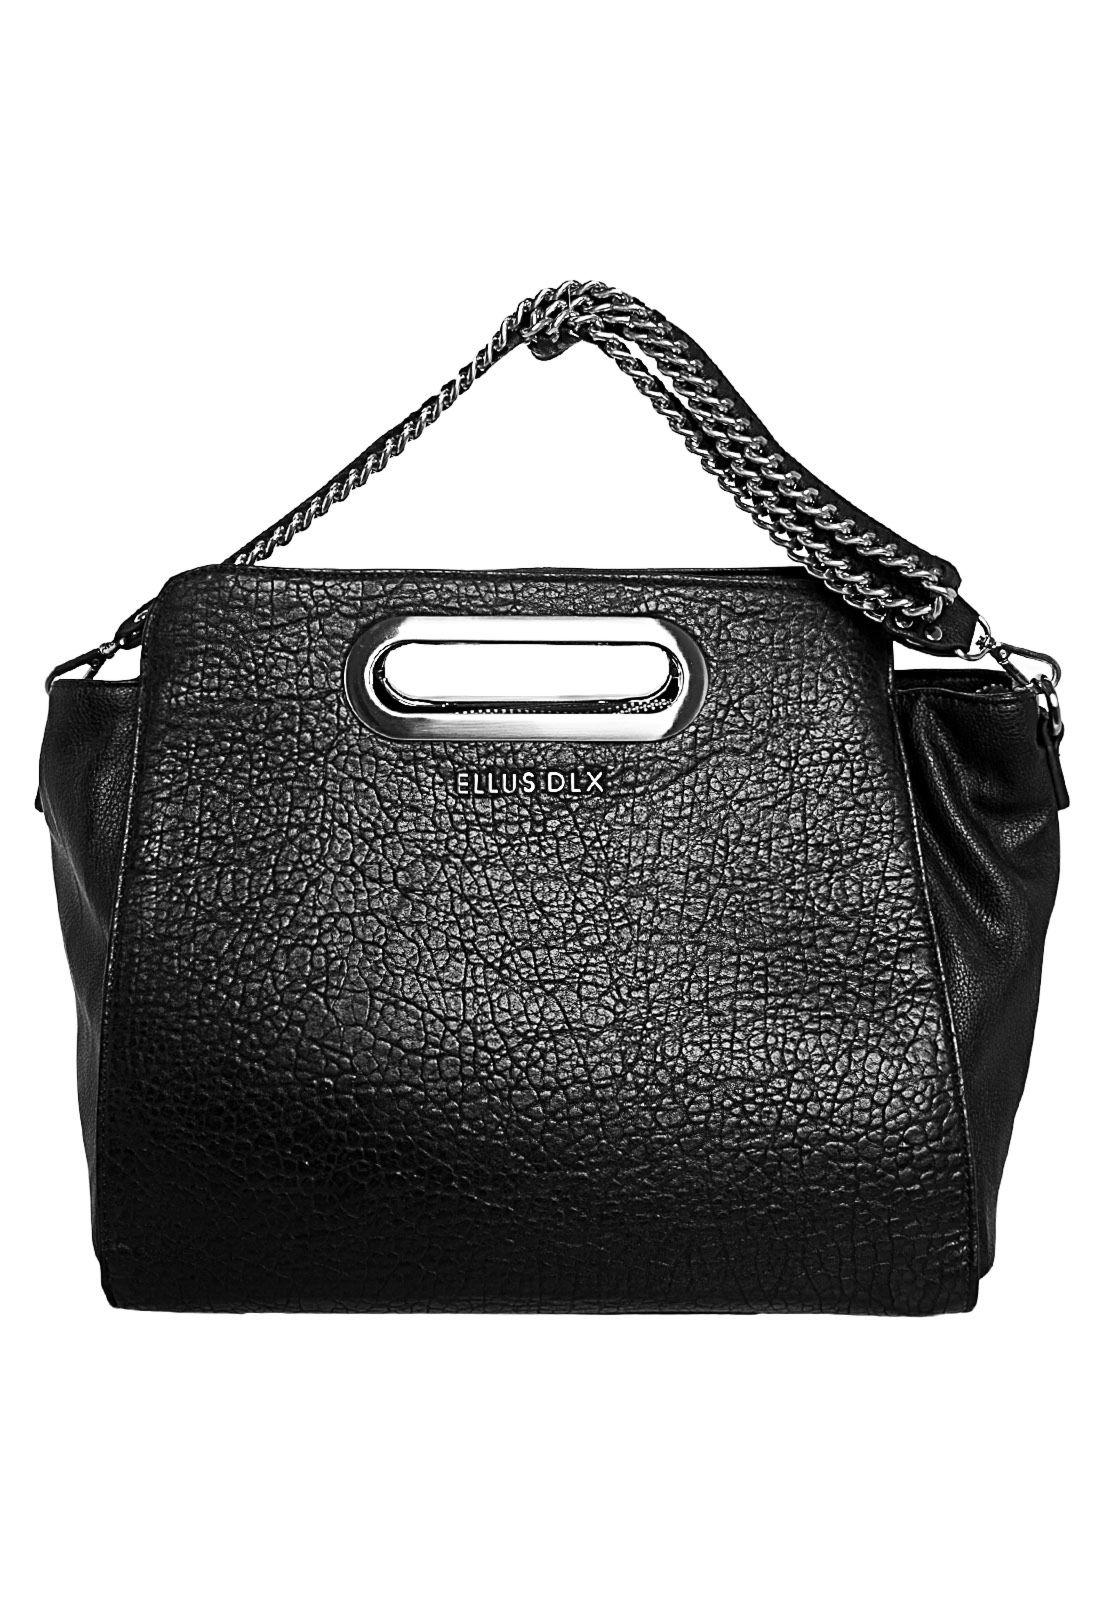 7e80f9141 Bolsa Ellus Tote Bag Preta - Compre Agora | Dafiti Brasil